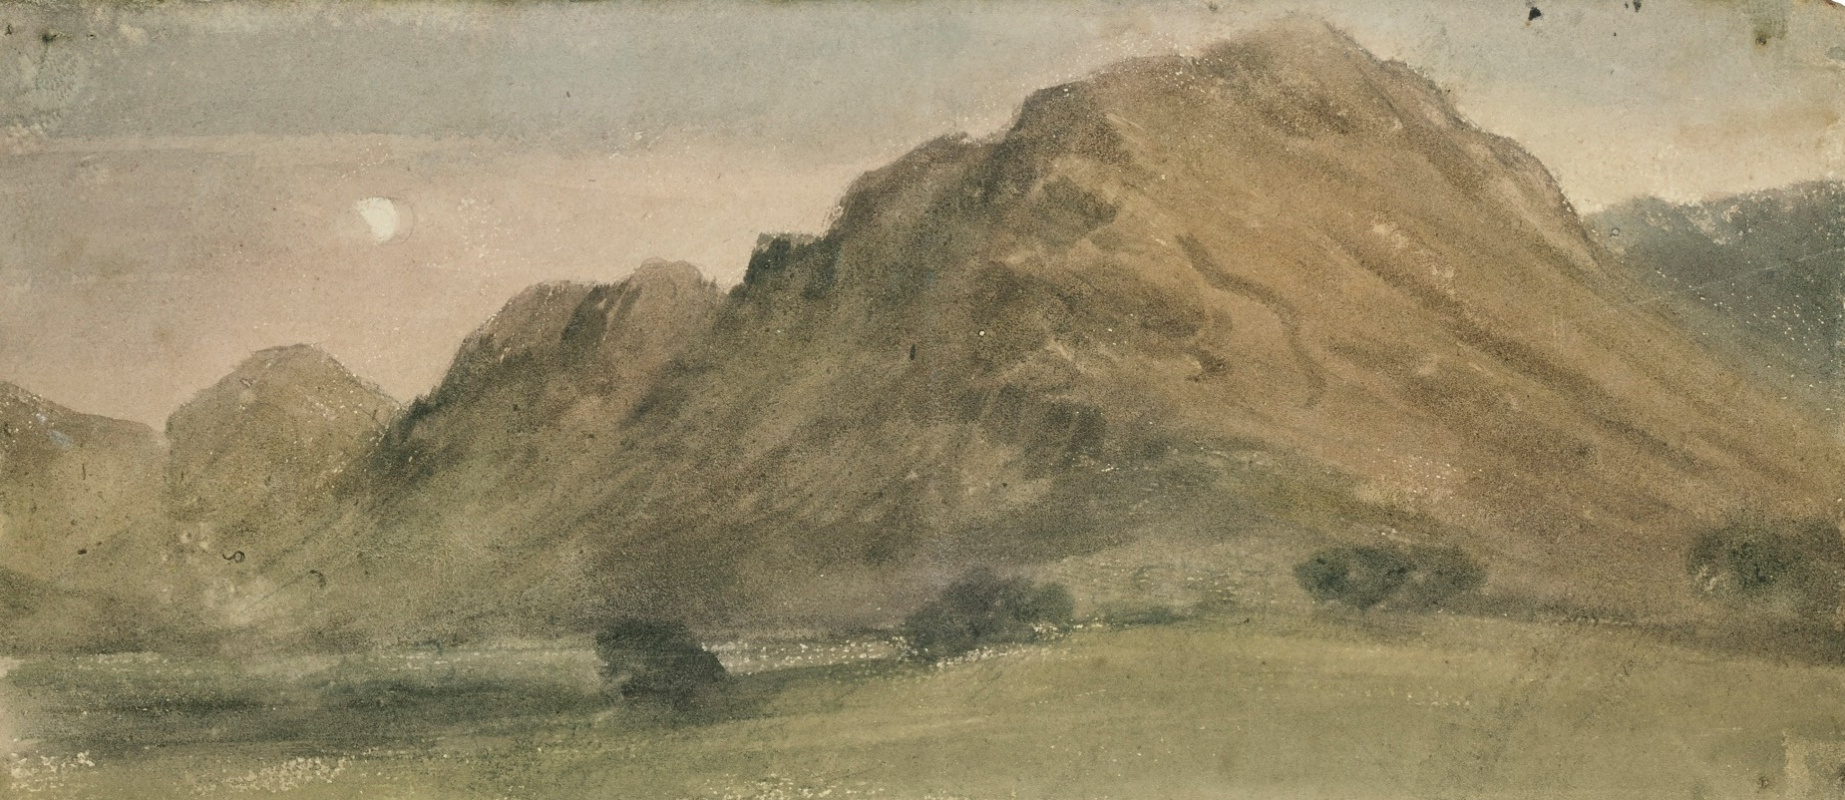 John Constable. Borrowdale in the moonlight